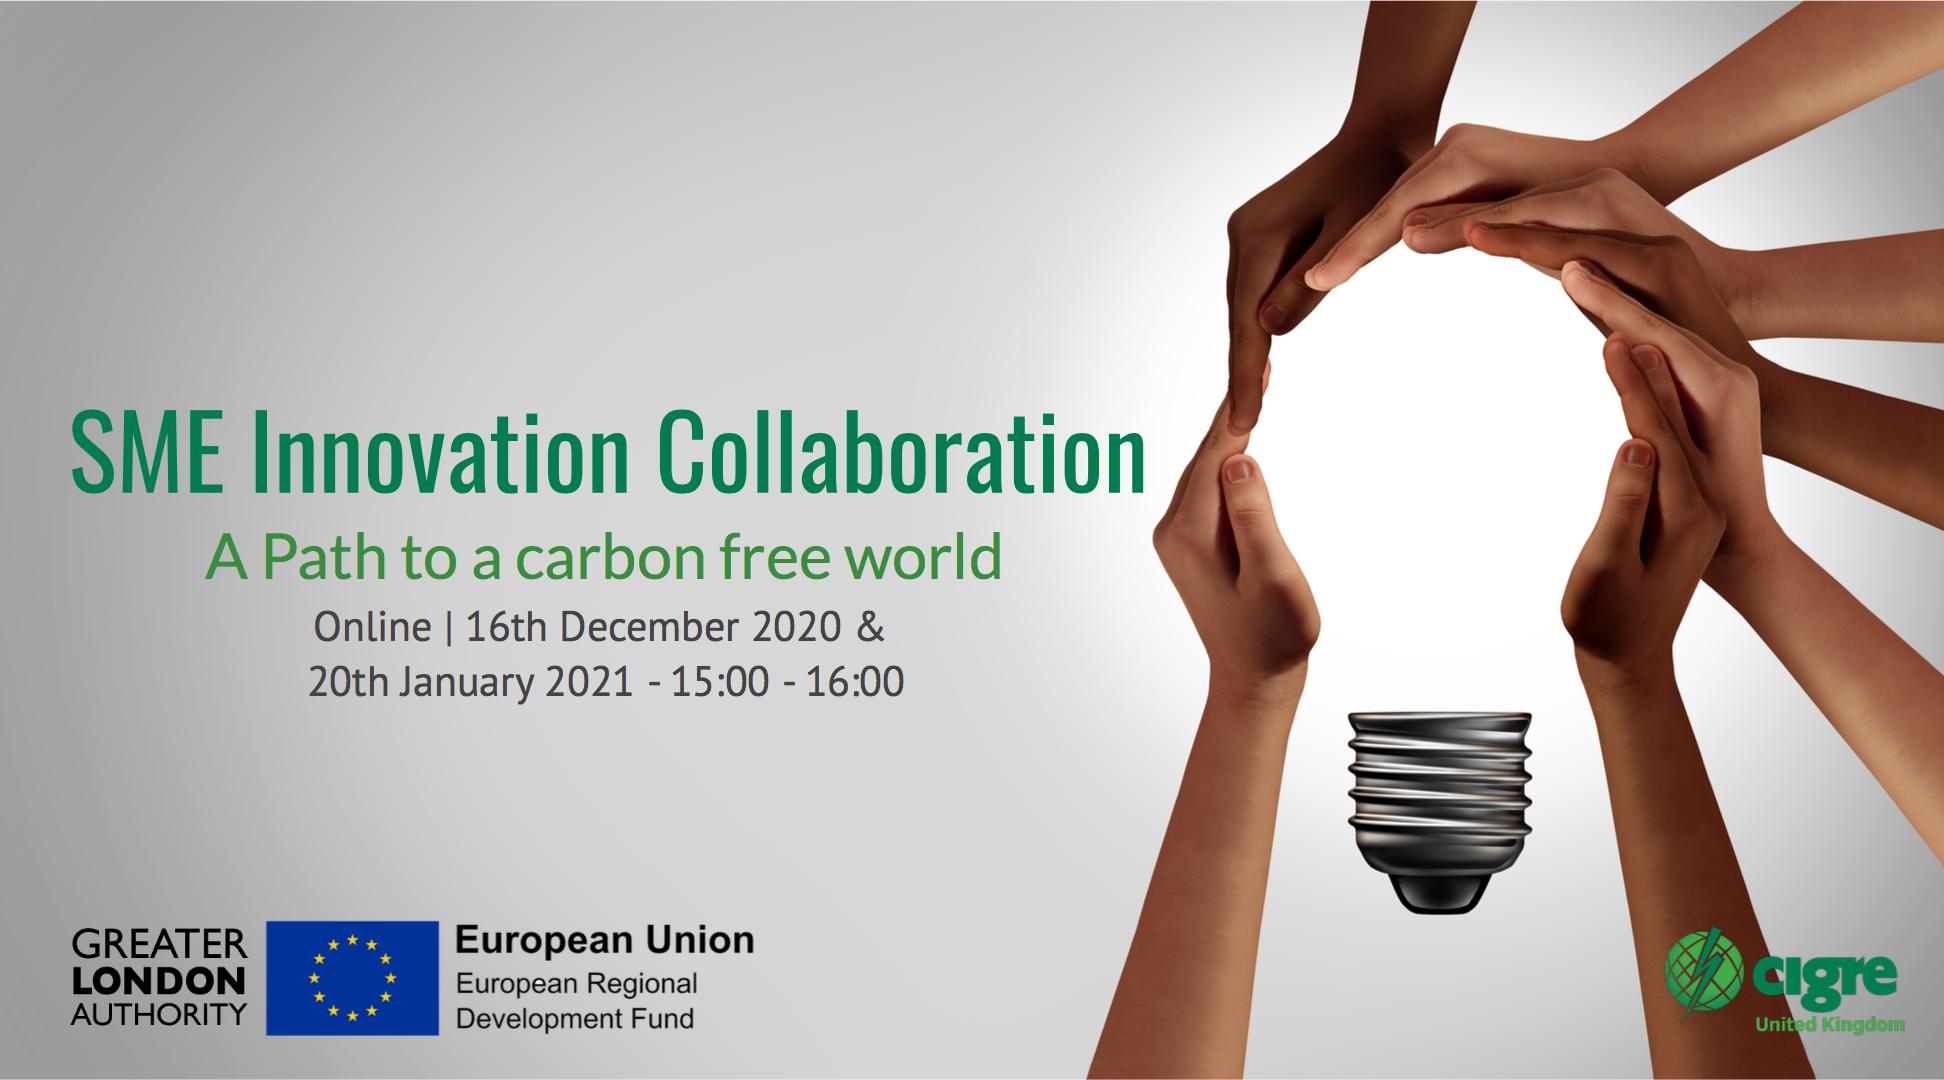 SME Innovation collaboration[1]